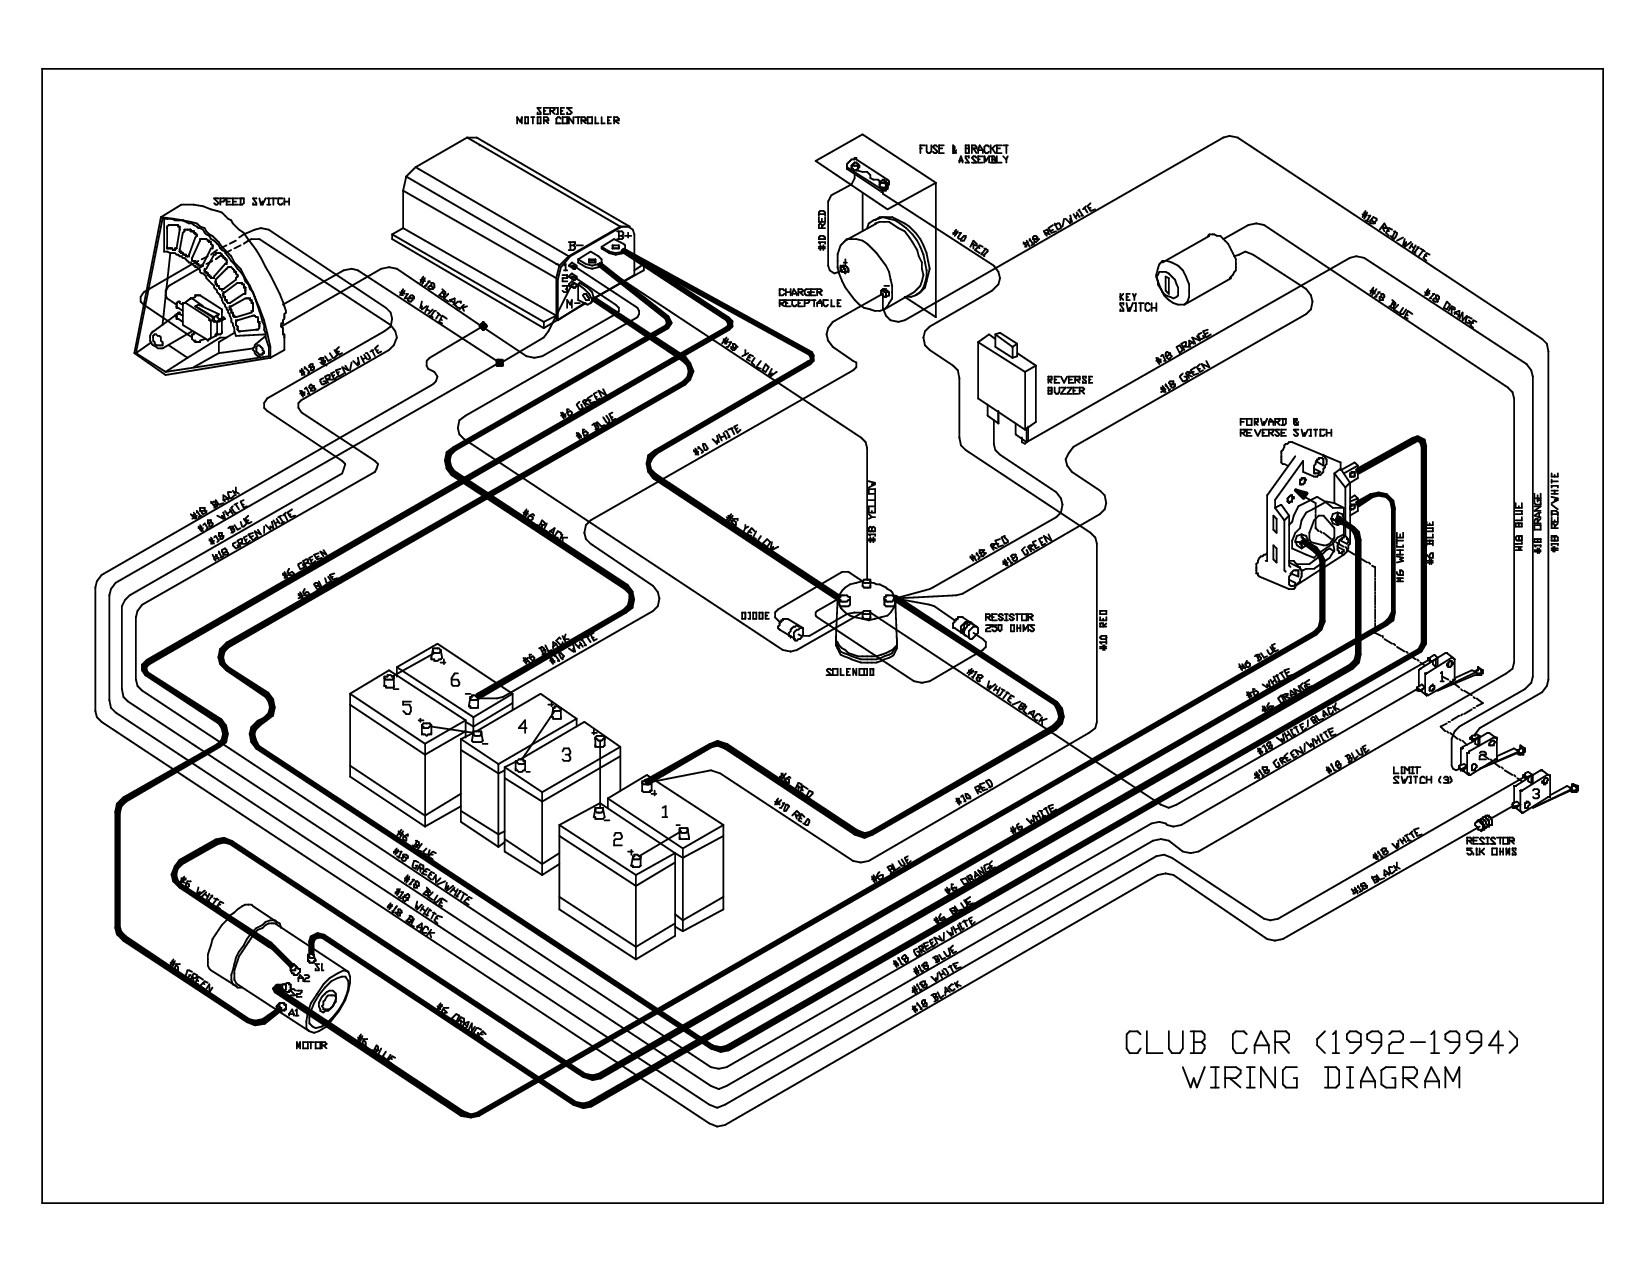 hight resolution of 1994 honda accord engine diagram automotive wiring diagram 1992 honda accord wiring diagram speed of 1994